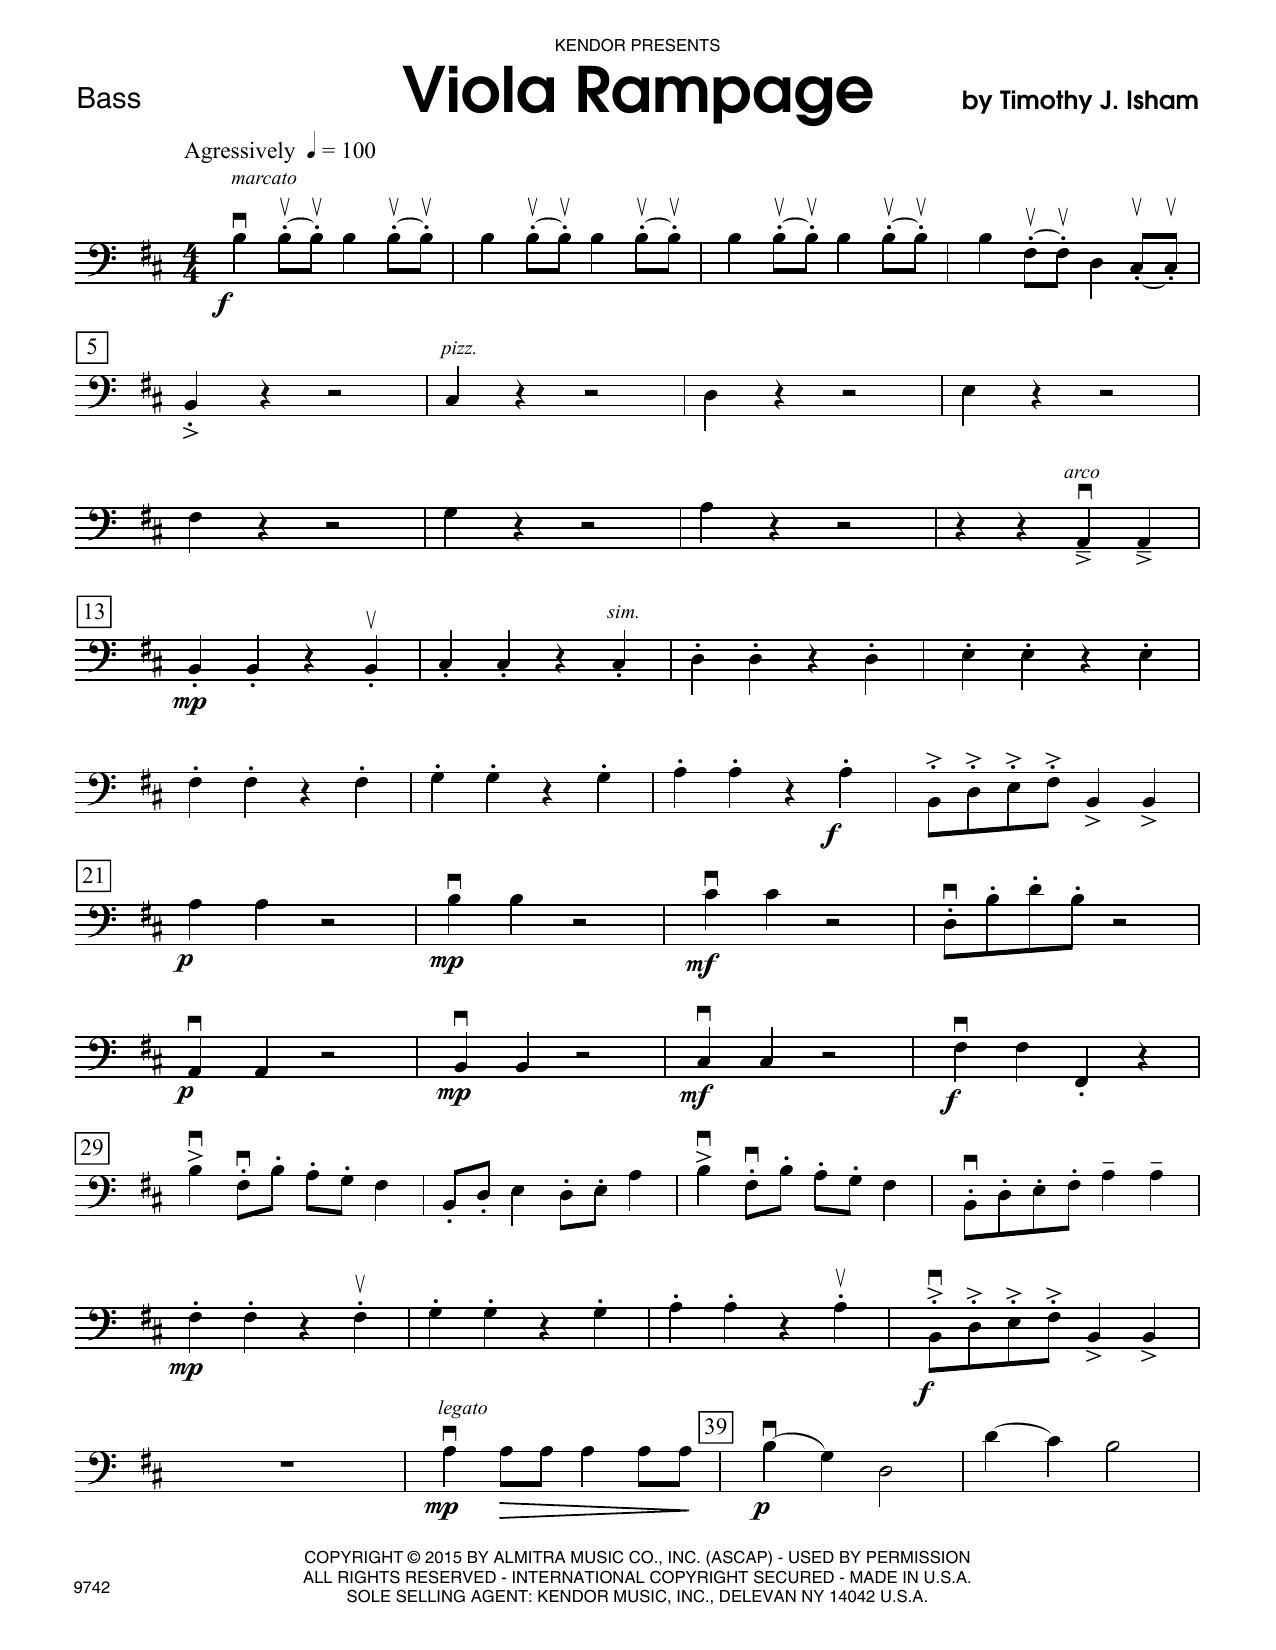 Viola Rampage - Bass